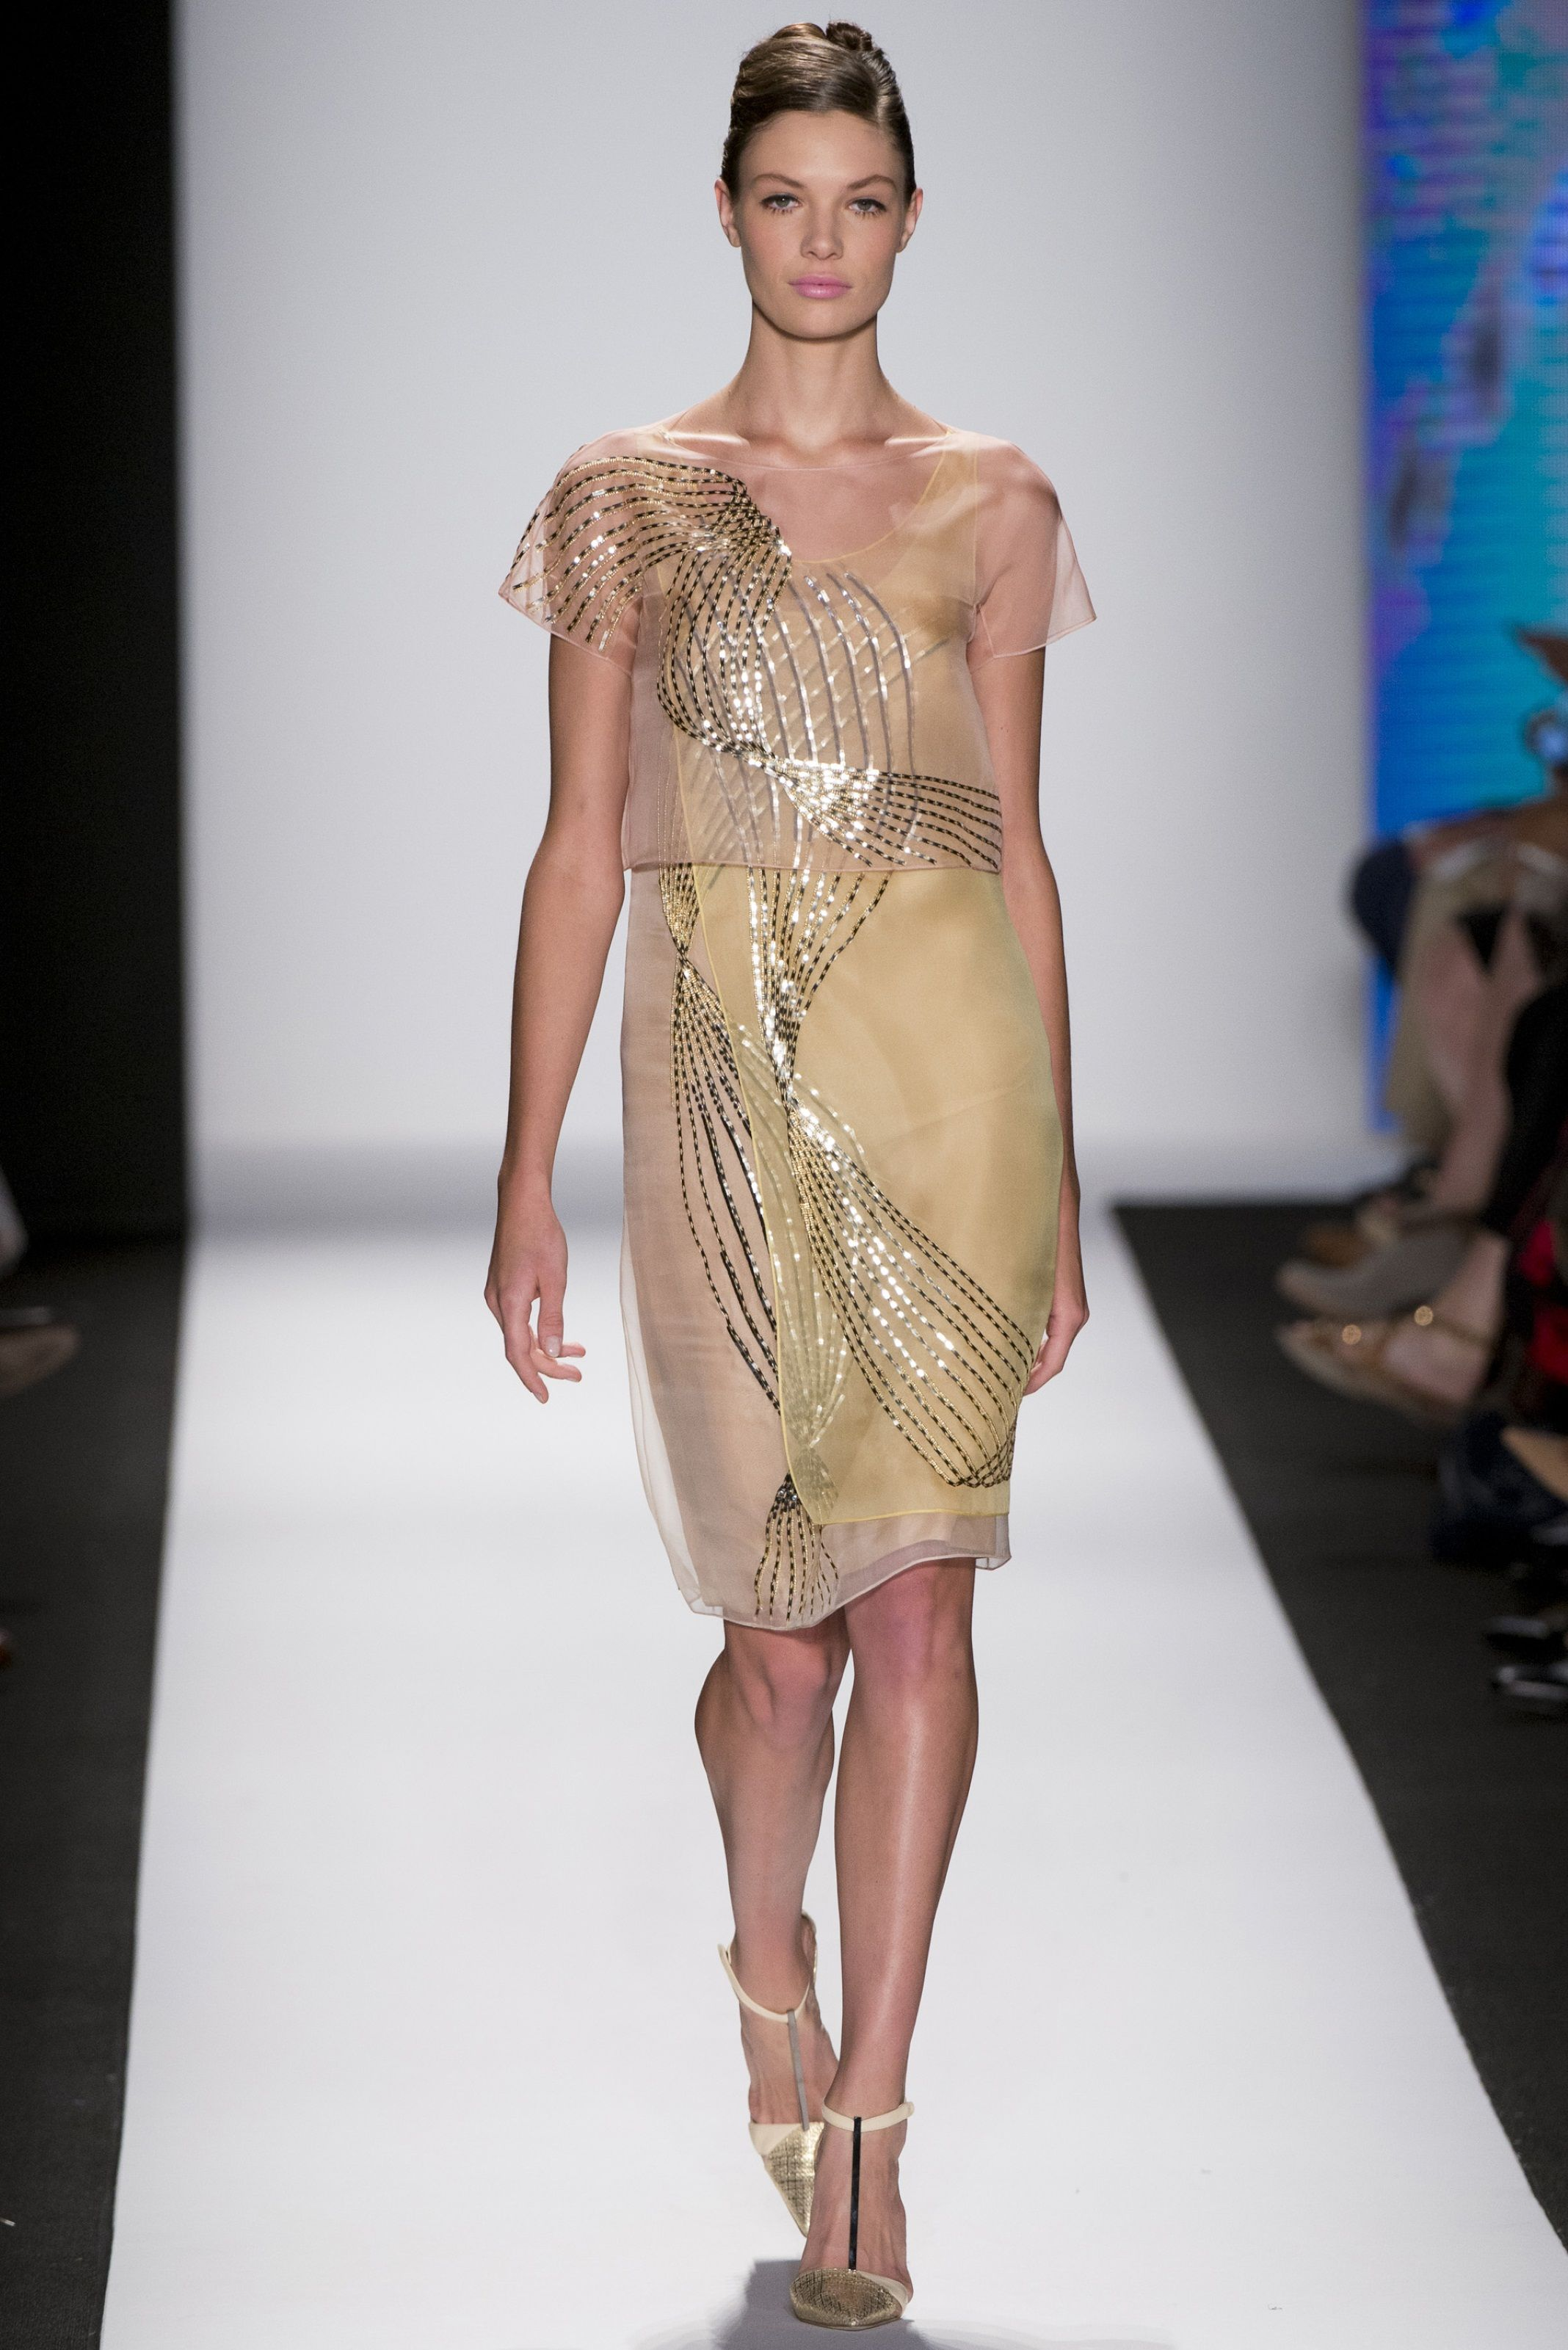 Carolina Herrera SpringSummer 2013 RTW – New York Fashion Week Carolina Herrera SpringSummer 2013 RTW – New York Fashion Week new photo